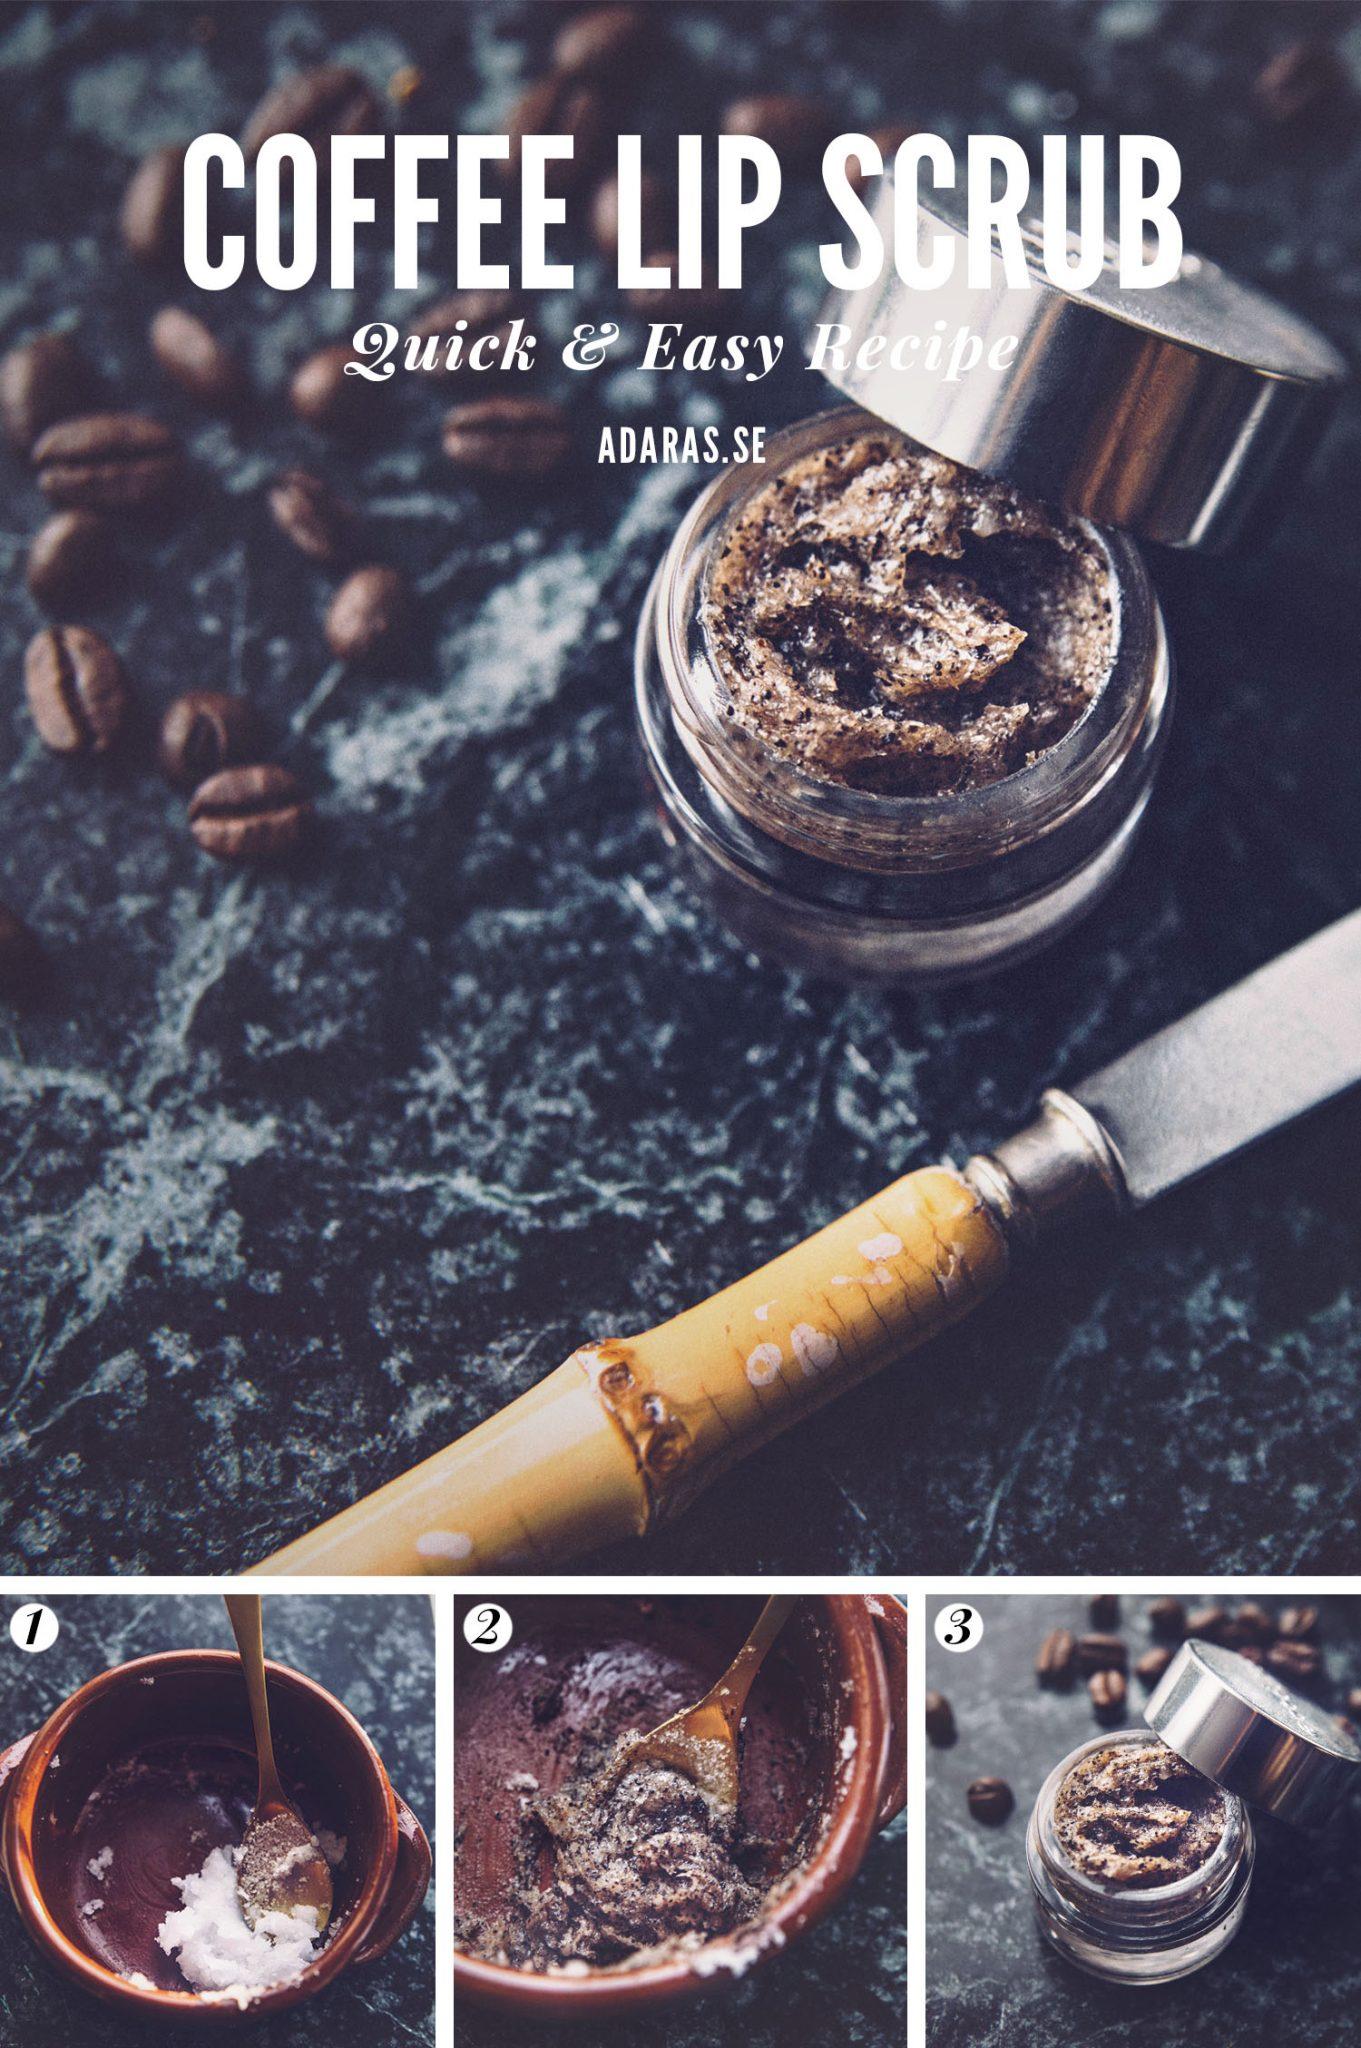 DIY: Coffe Lip Scrub with coffee grounds, coconut oil and sugar